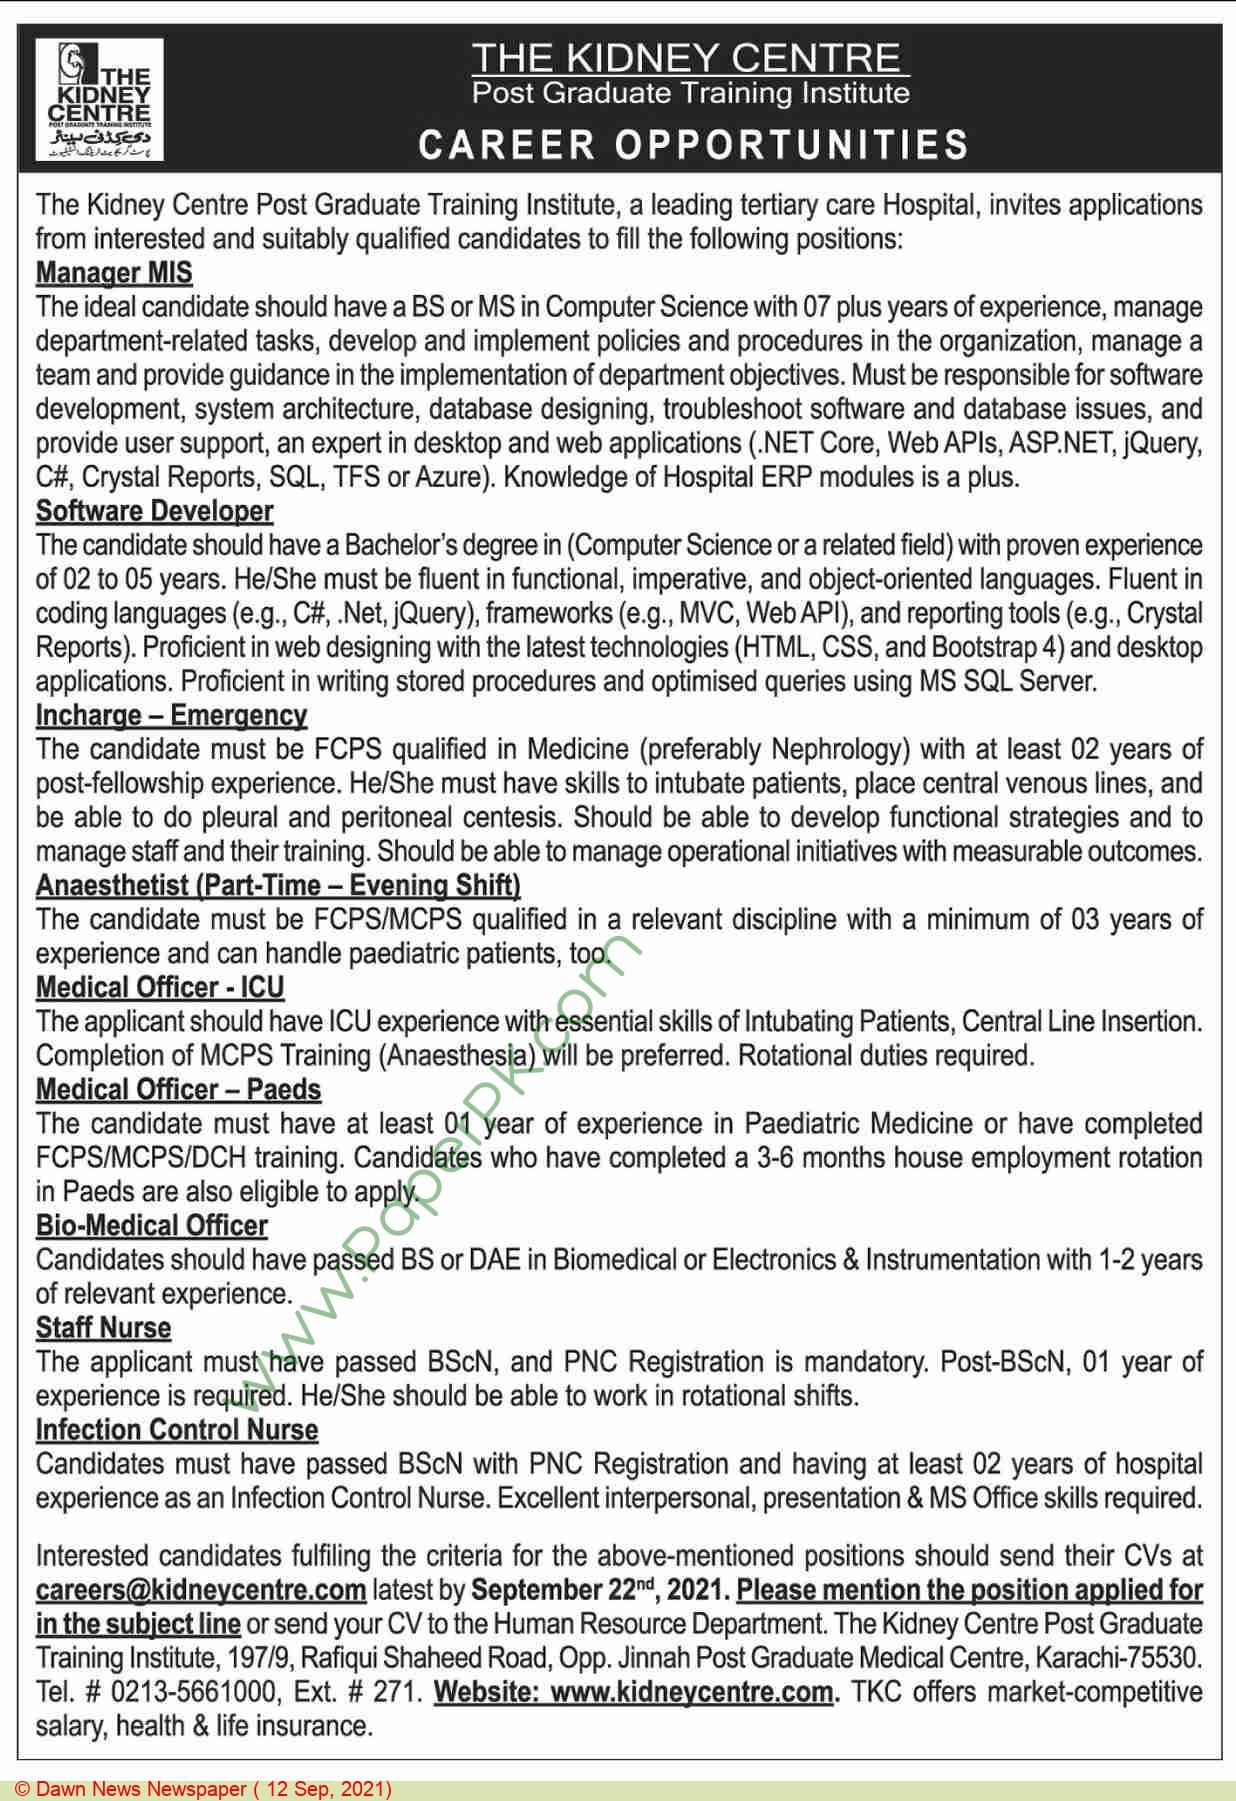 The Kidney Centre Postgraduate Training Institute jobs newspaper ad for Medical Officer in Karachi on 2021-09-12